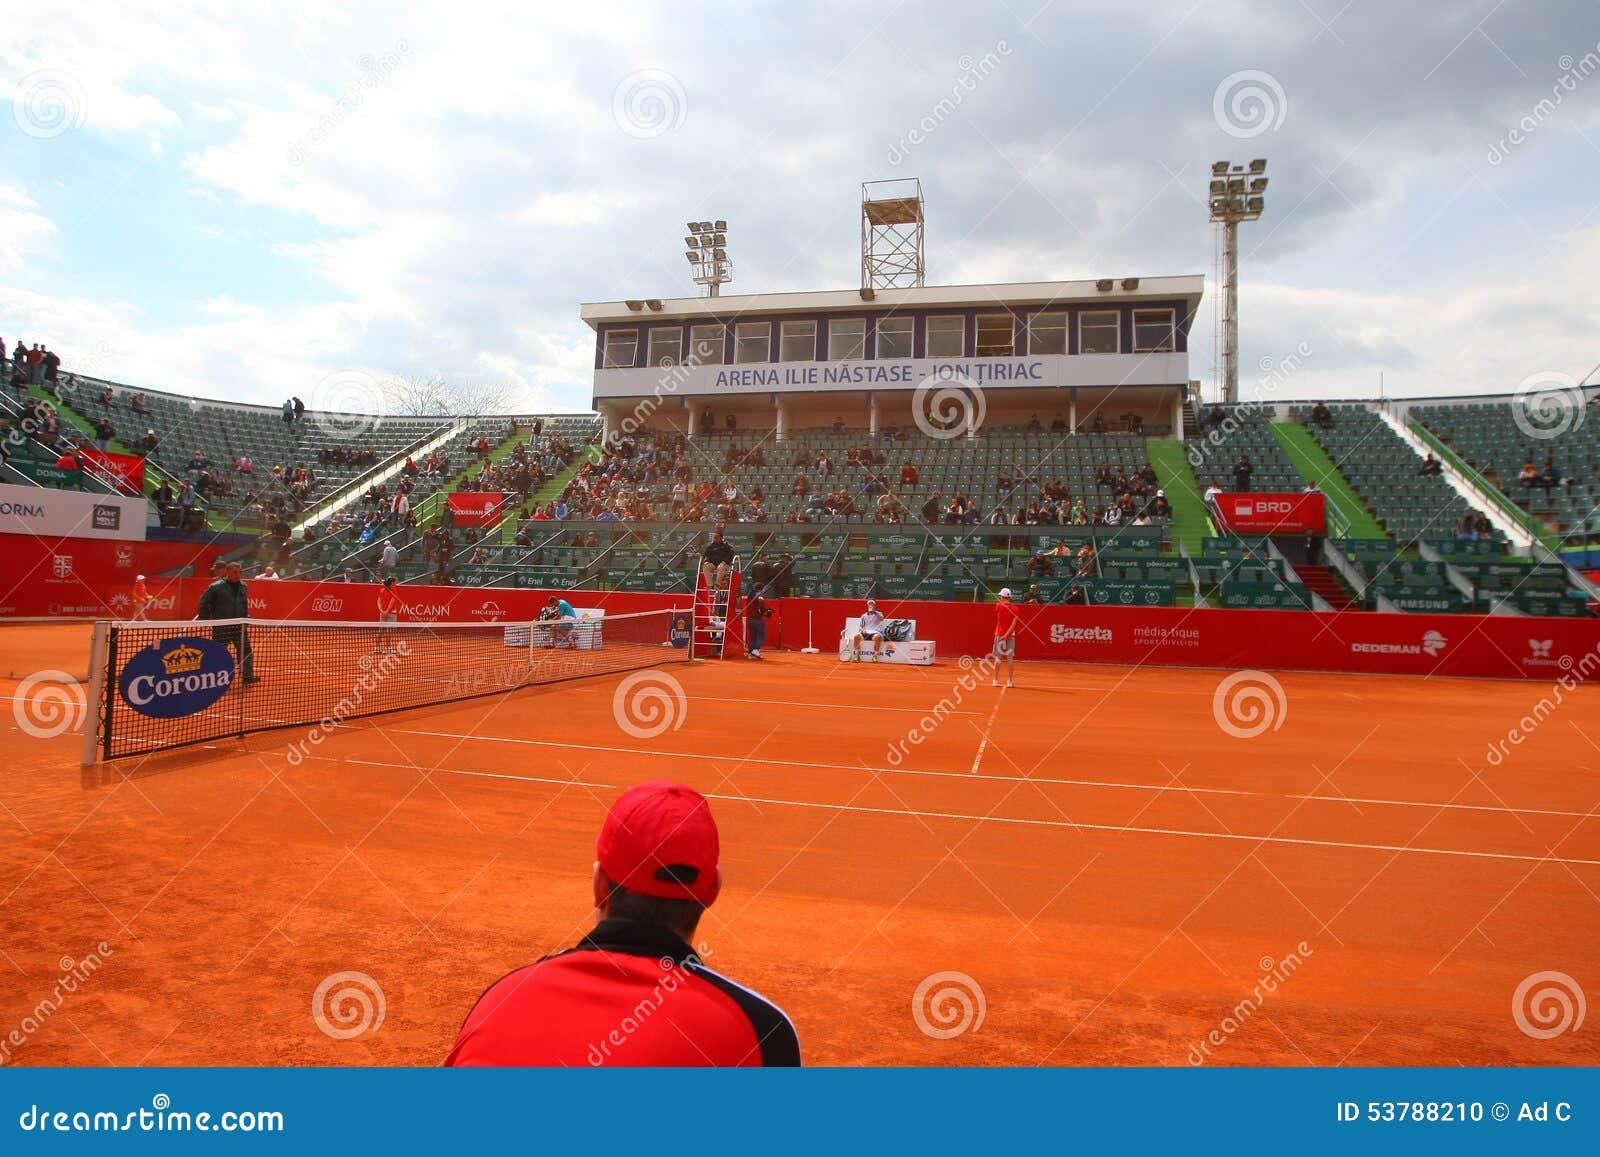 Nastase Tiriac arena podczas Tenisowego dopasowania Między GIMENO-TRAVER - Viktor TROICKI